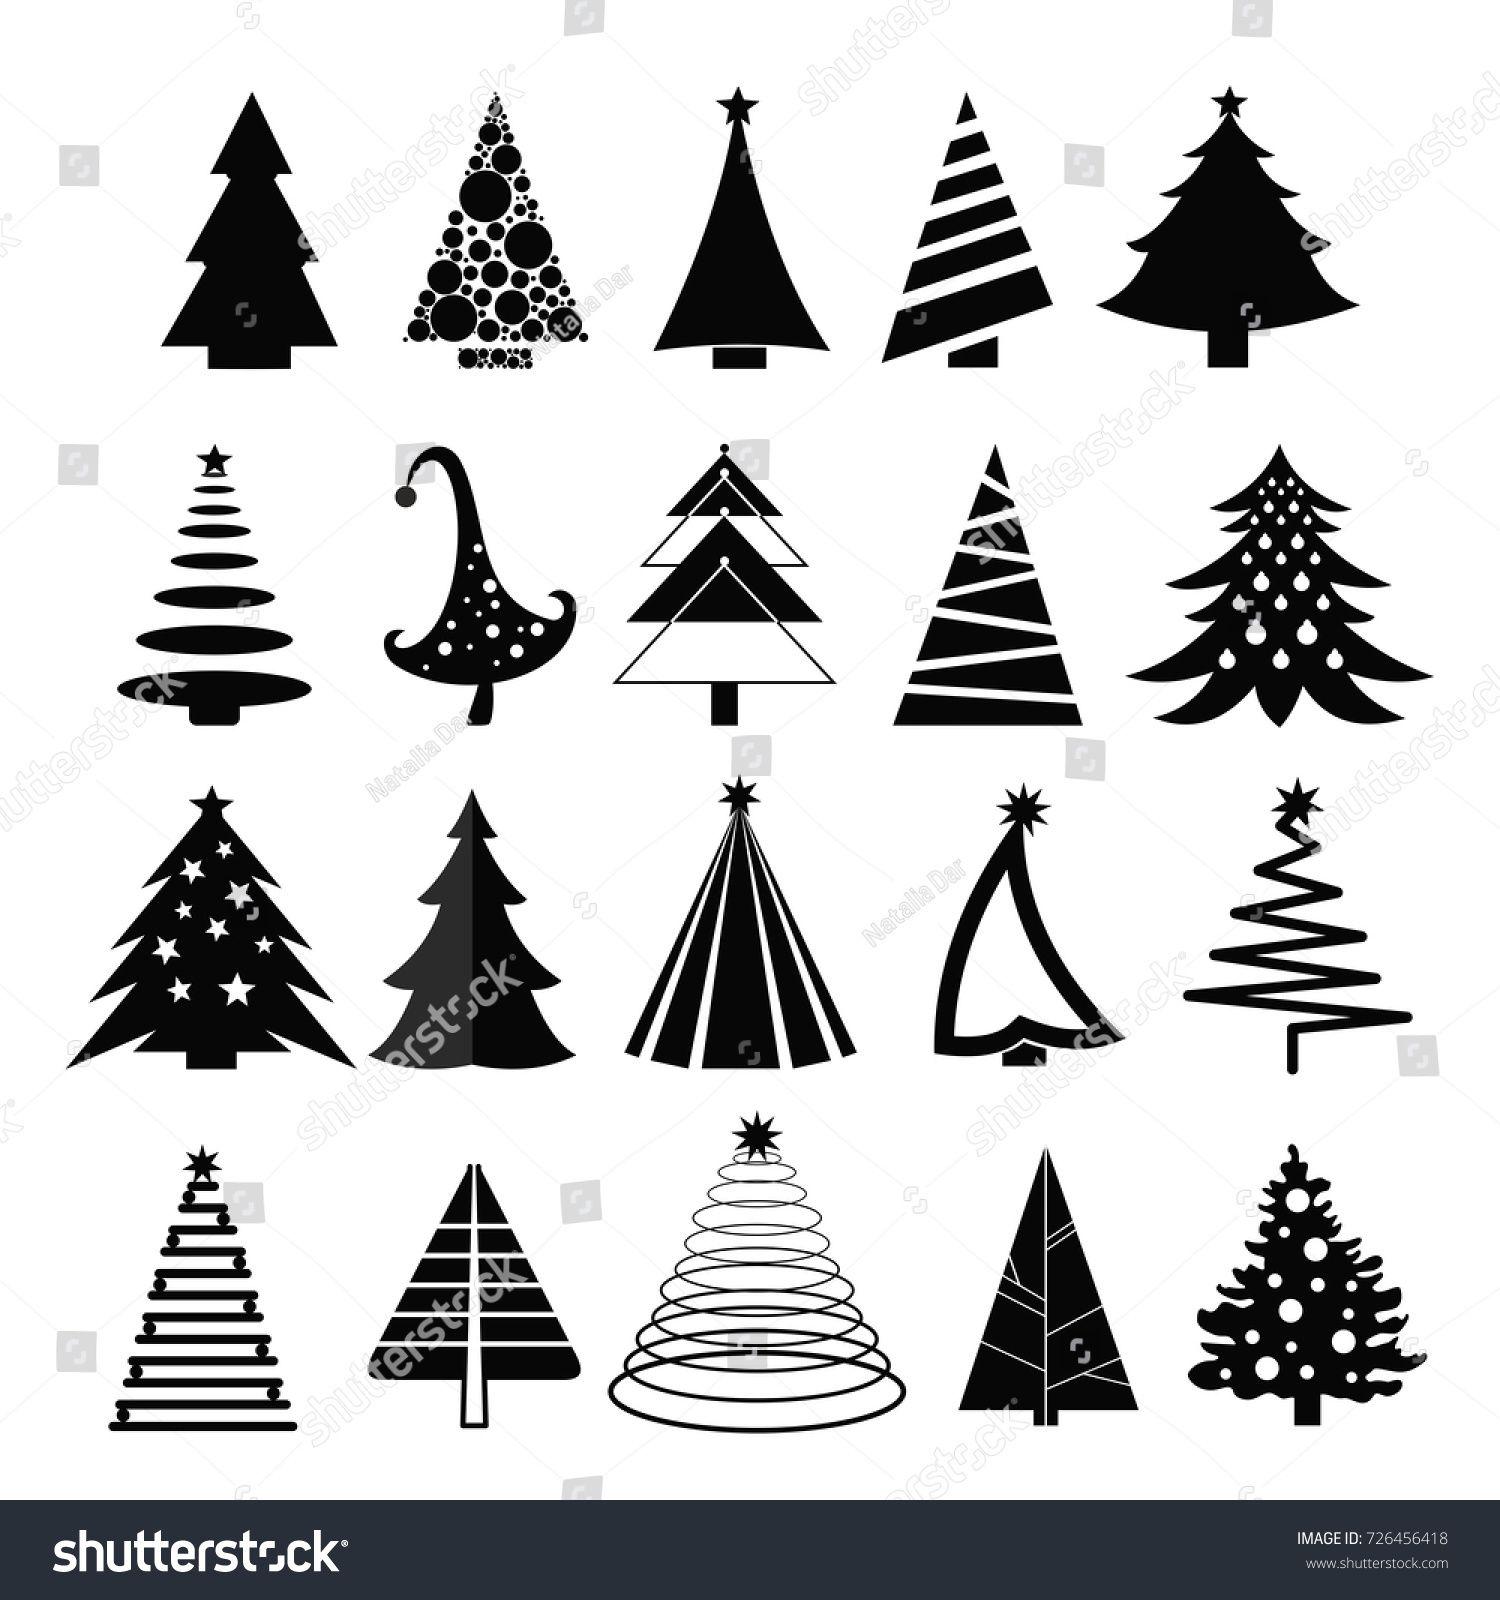 Vector illustration set of christmas trees silhouette on